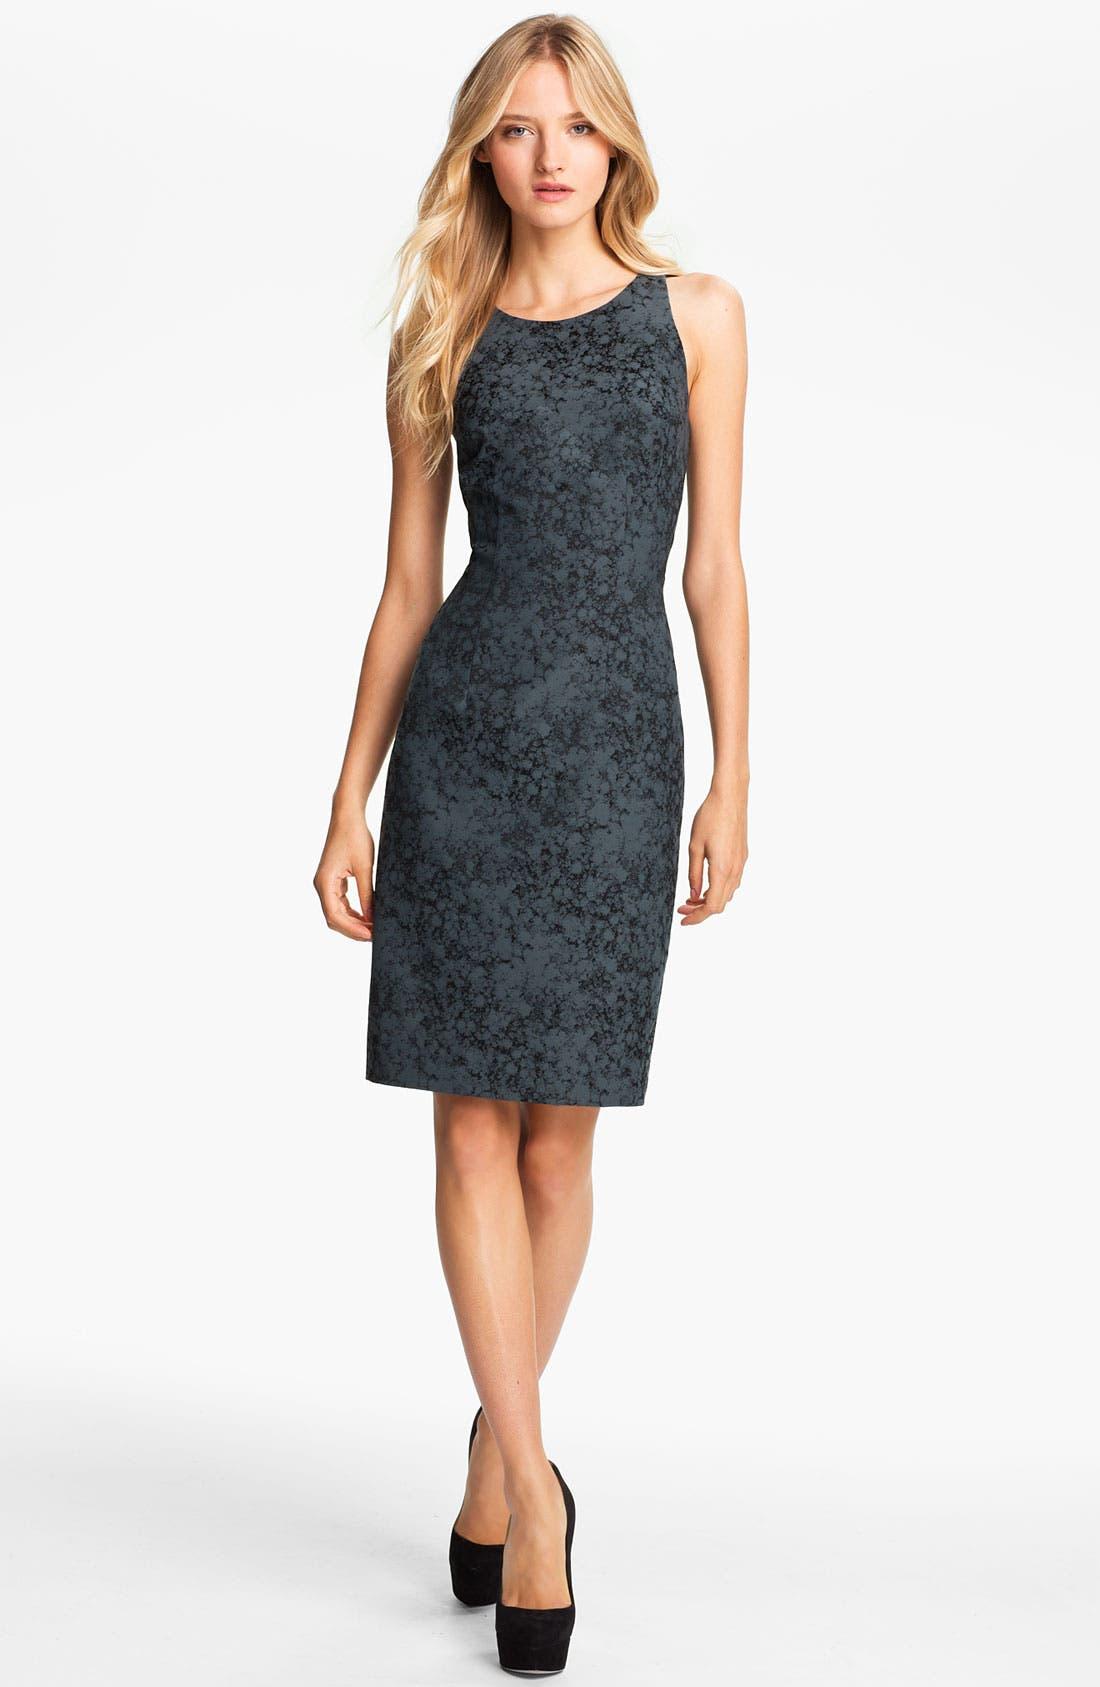 Main Image - Jay Godfrey 'Naomi' Abstract Print Dress (Nordstrom Exclusive)